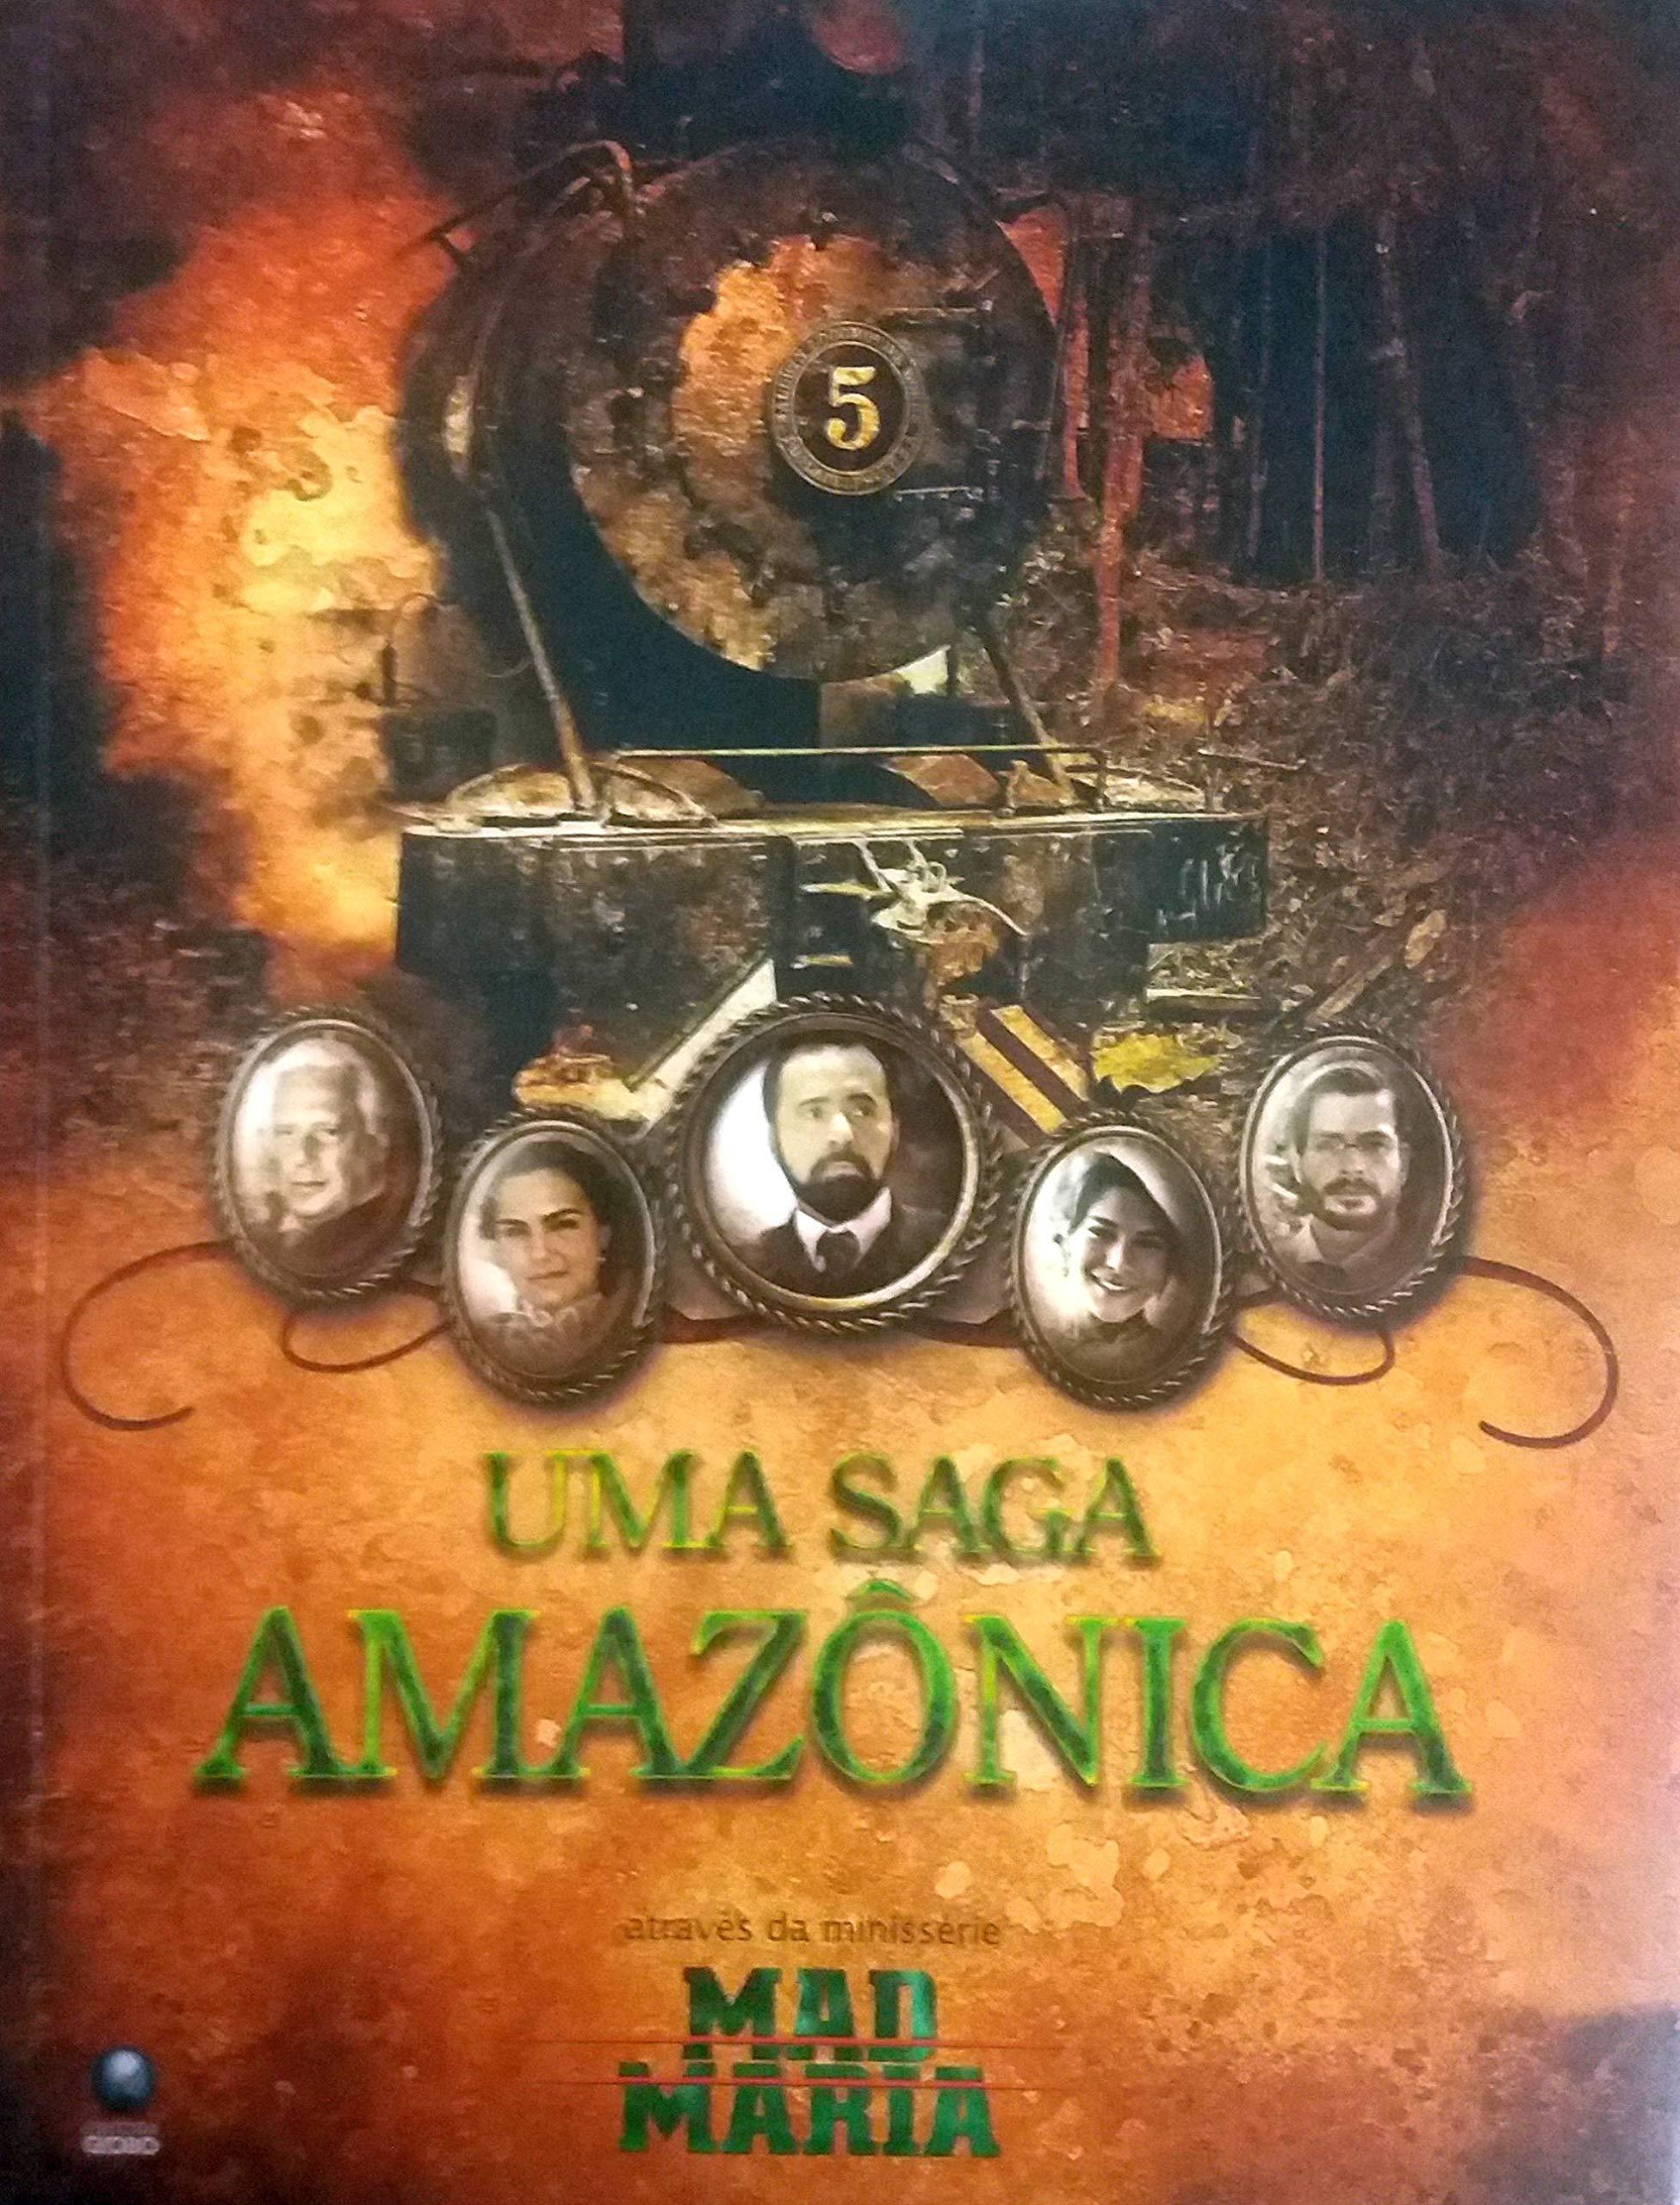 Uma Saga Amazonica - Atraves Da Minisserie Mad Maria | Amazon.com.br